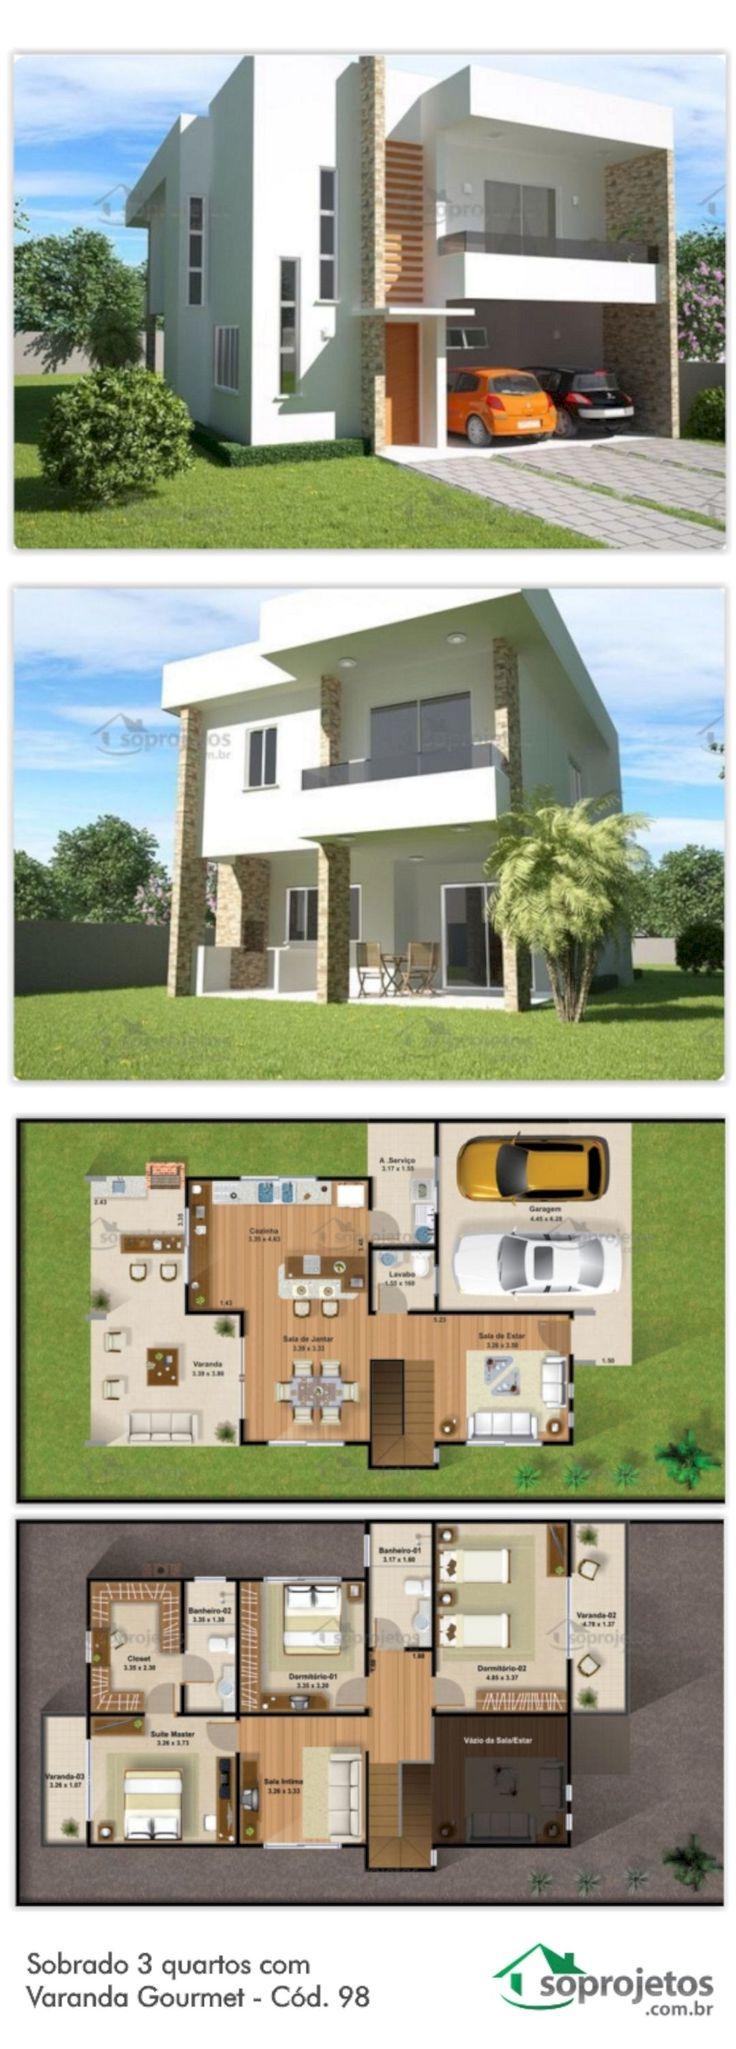 Well-Designed 3D House Plan Design Ideas https://www.futuristarchitecture.com/23493-3d-house-plan.html